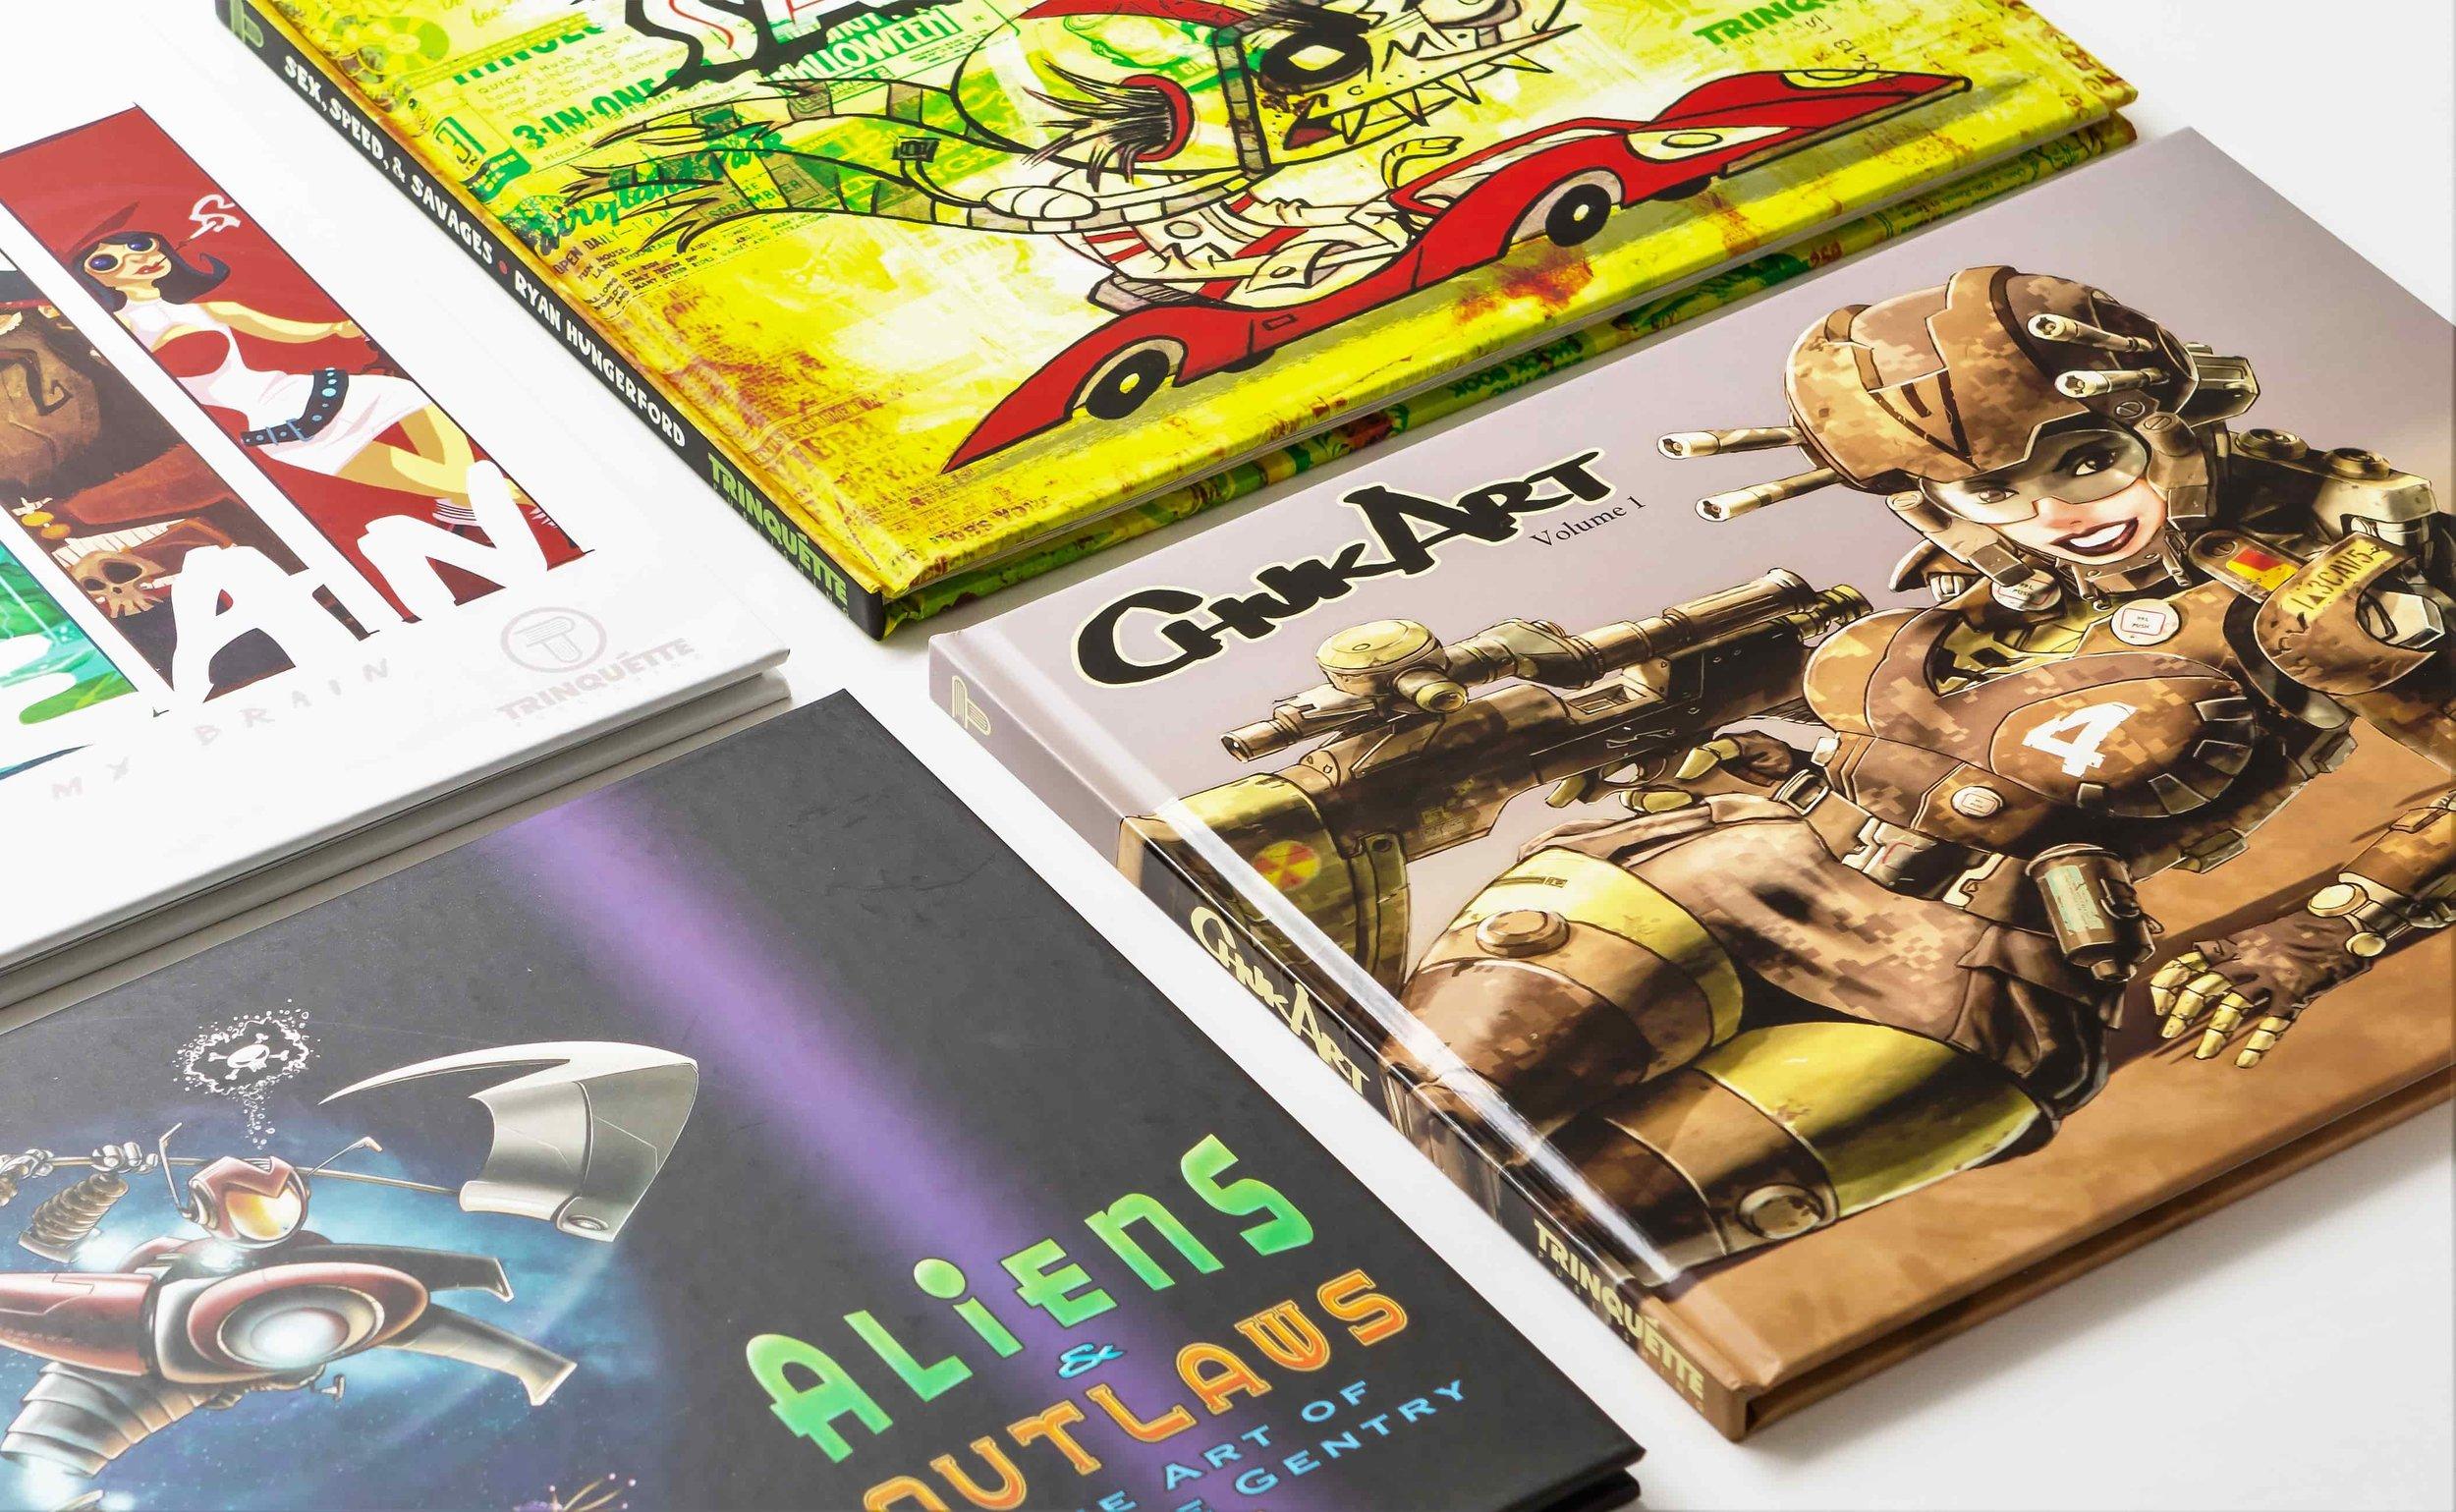 comic-books-printing-in-china.jpg